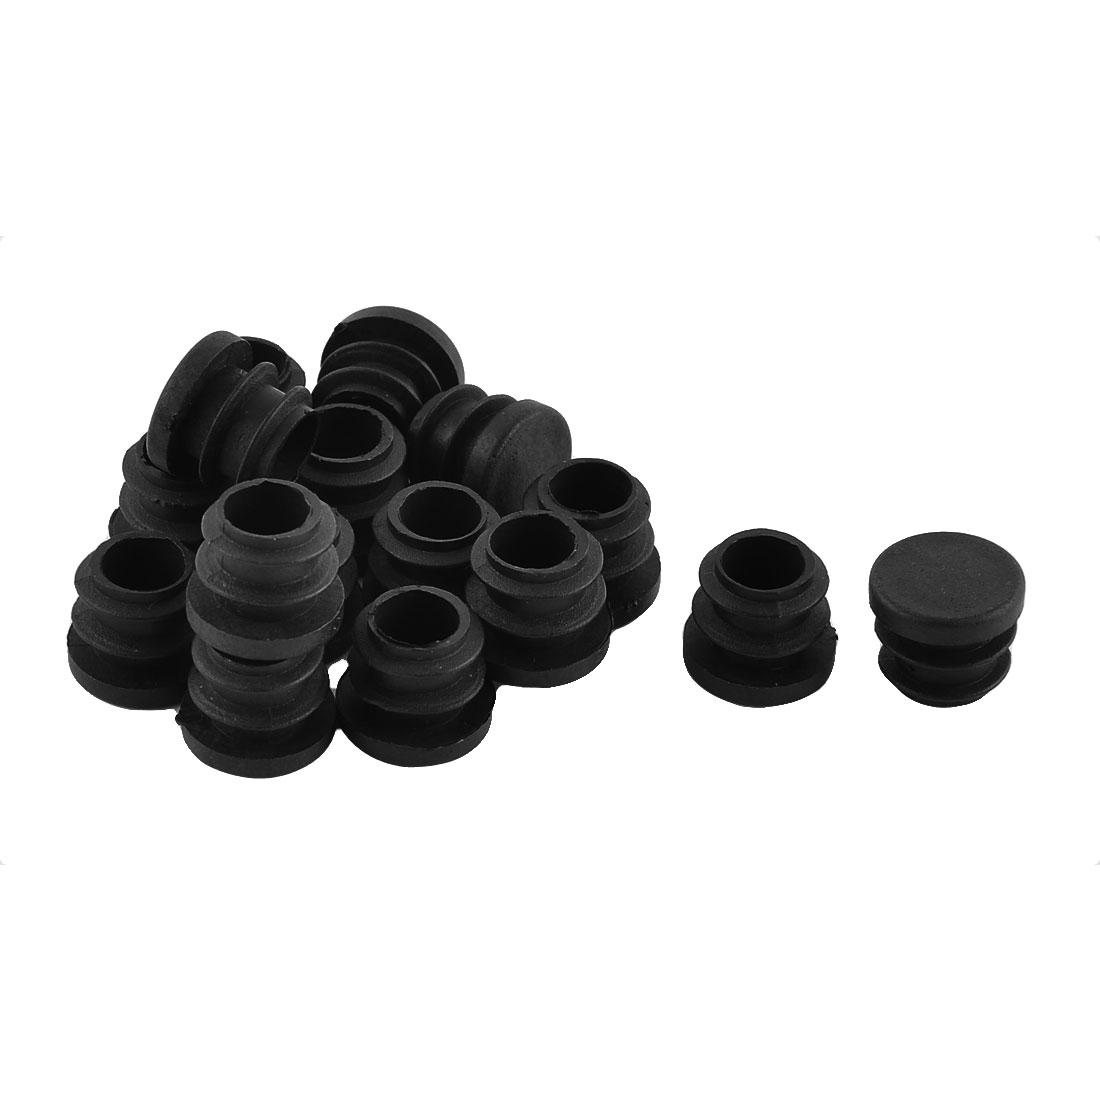 Furniture Desk Chair Plastic Round Tube Insert Cap Covers Black 16mm Dia 16pcs